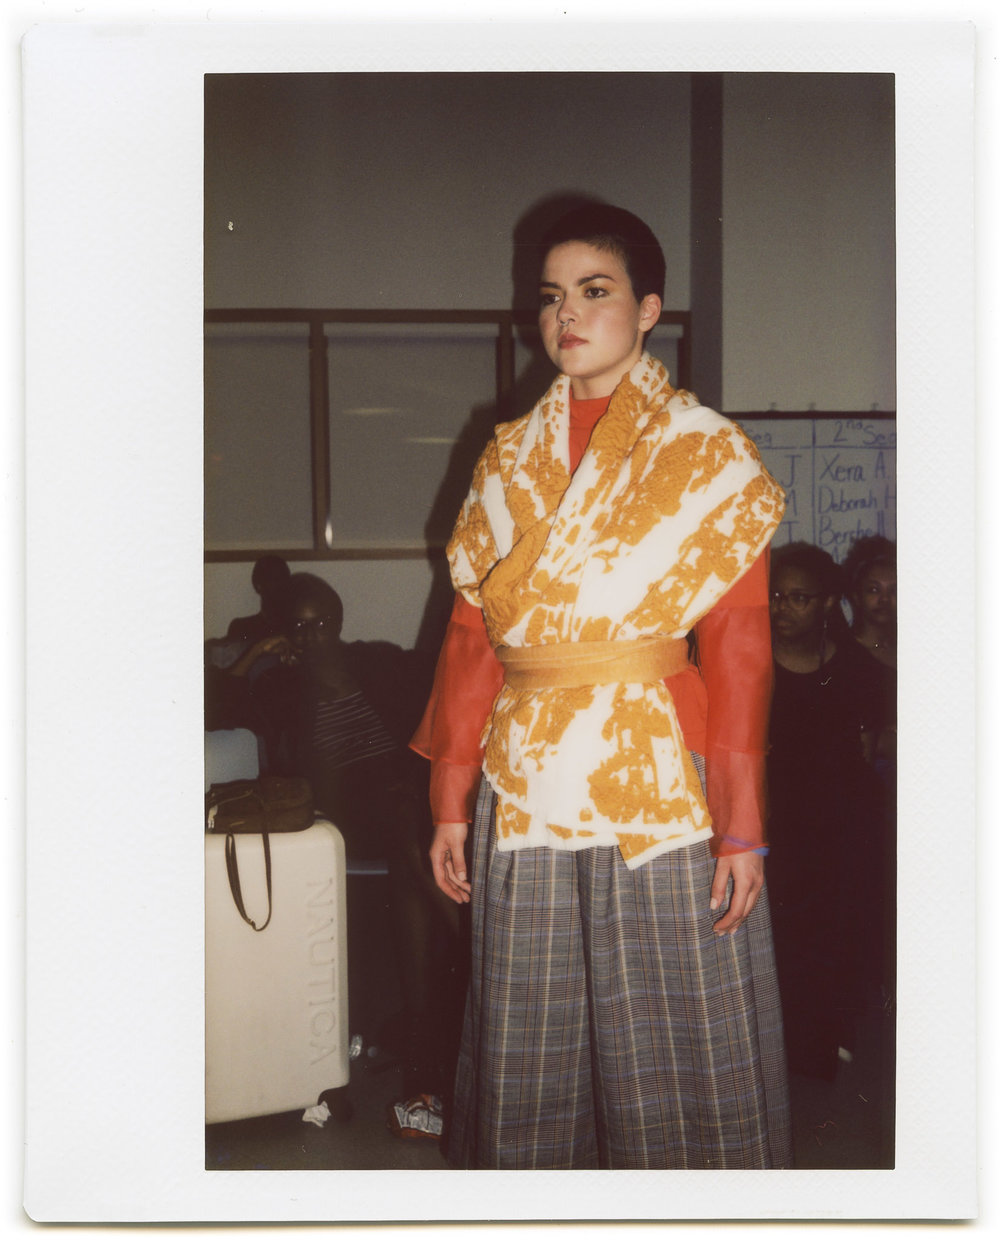 BKL Fashion Show POLA - 06.jpg